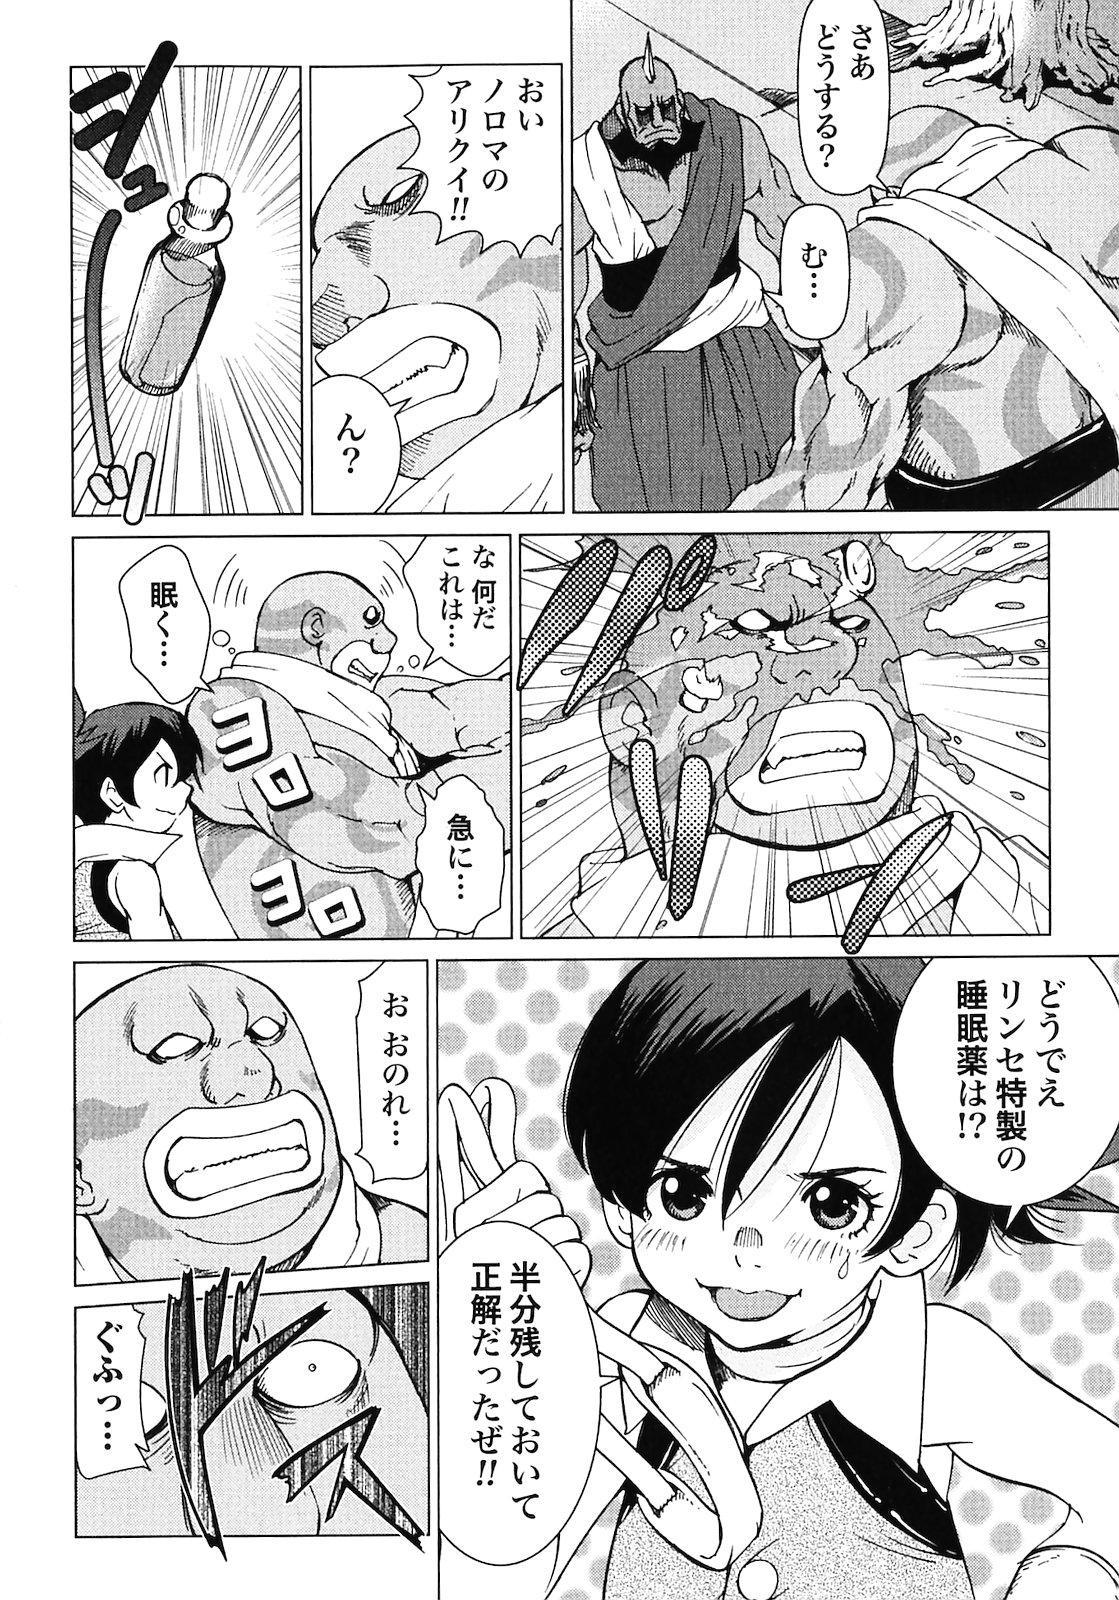 Makyo no Shanana Vol.02 143